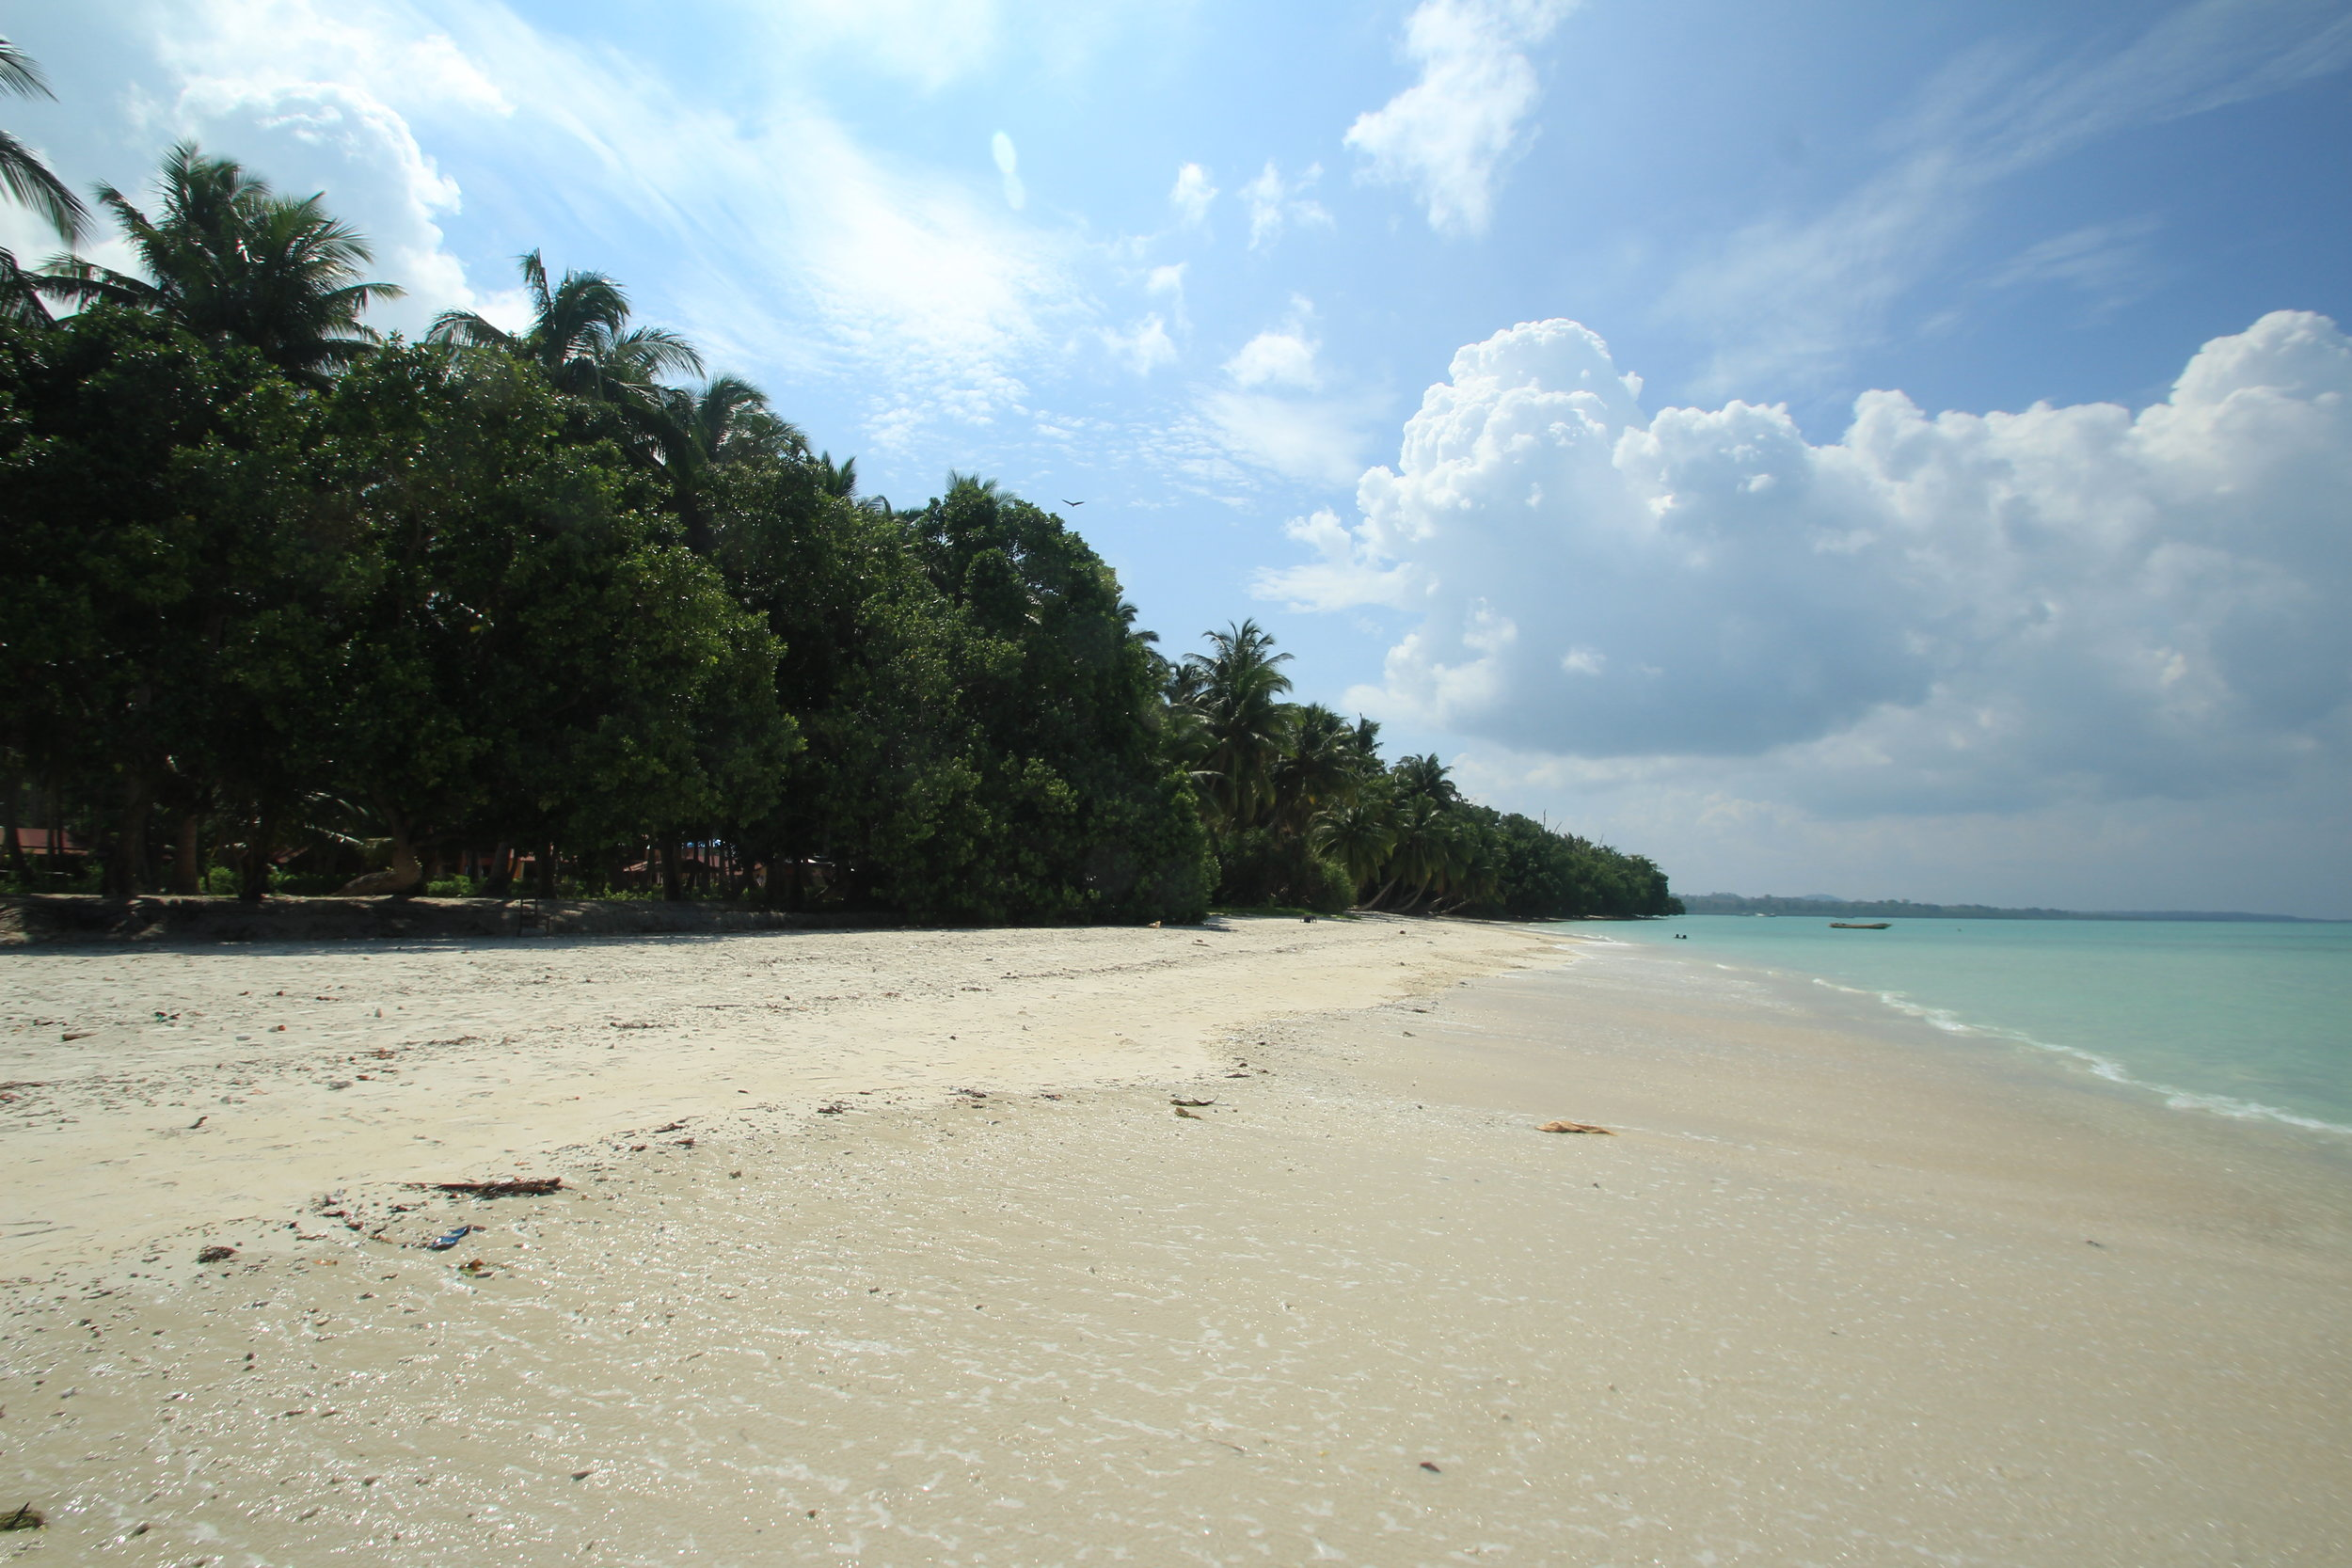 Shoreline from Wild Orchid resort